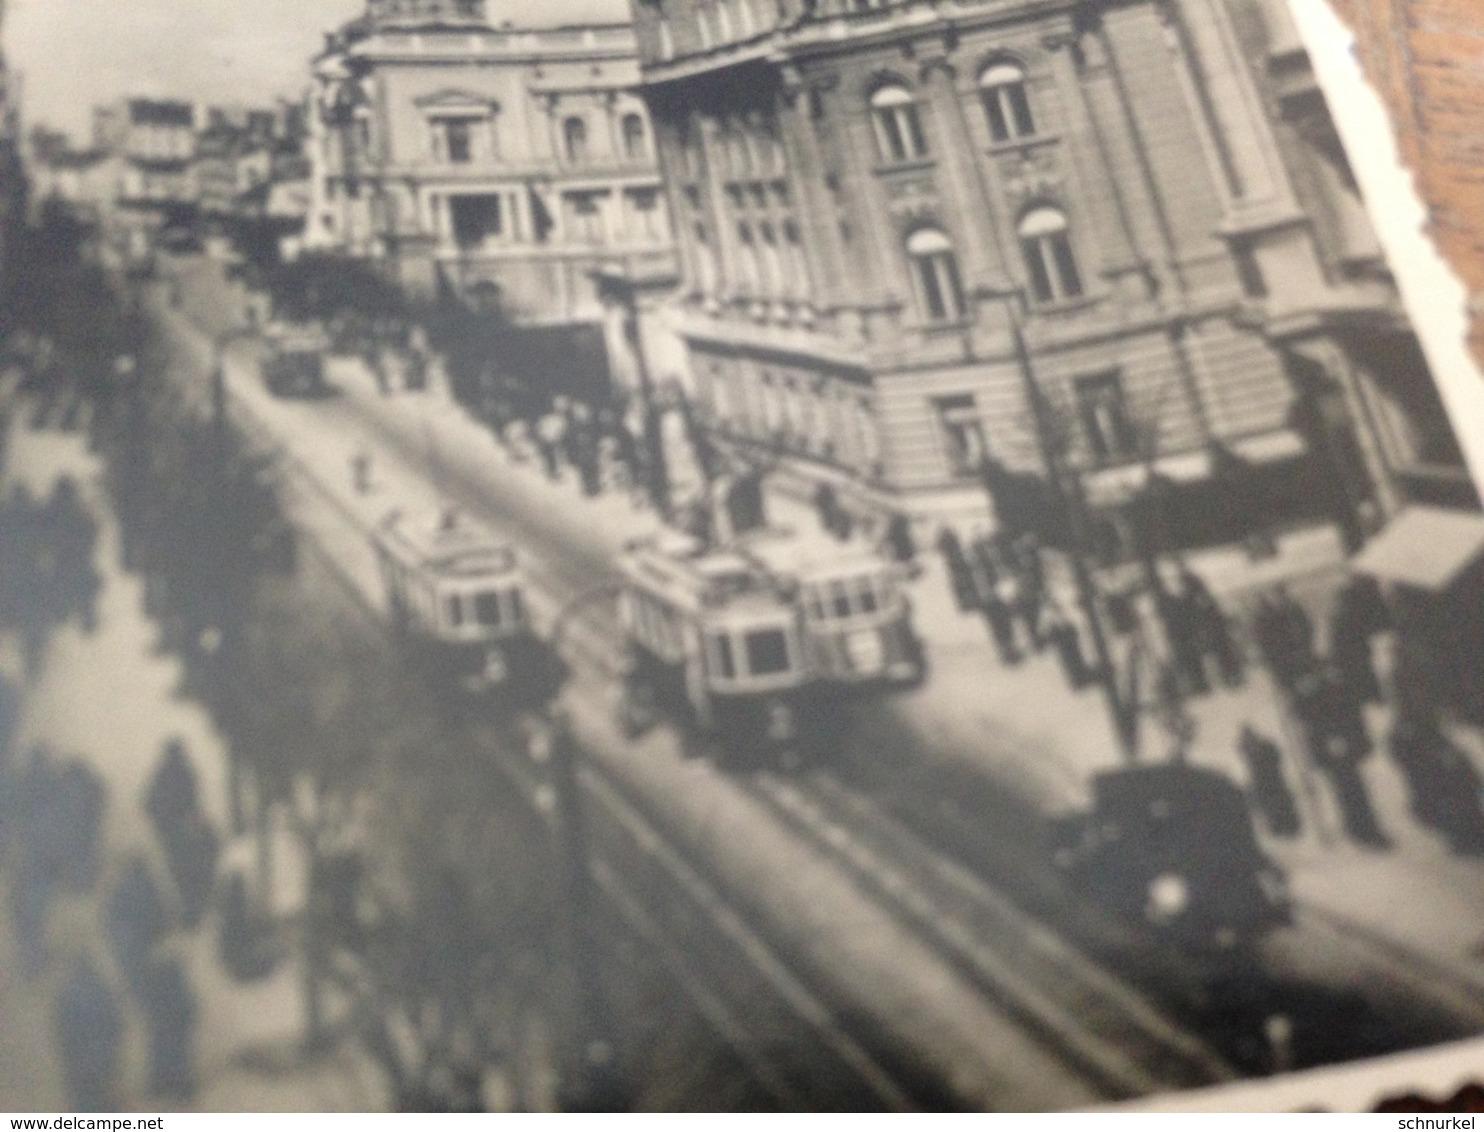 BELGRAD - BEOGRADE - SERBIA - EX-JUGOSLAWIEN - 40/50er - 1 - RUE DU ROI MILAN - STRASSE KOENIG MILAN - TRAMWAYS - Luoghi